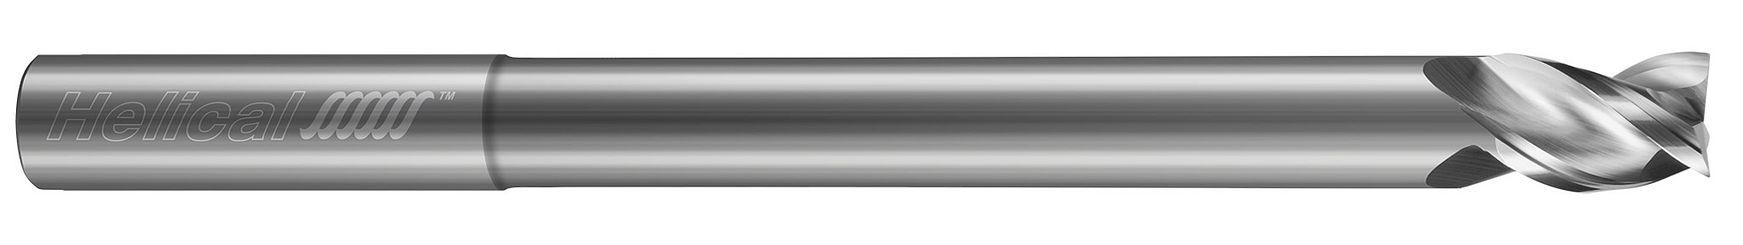 tool-details-46300